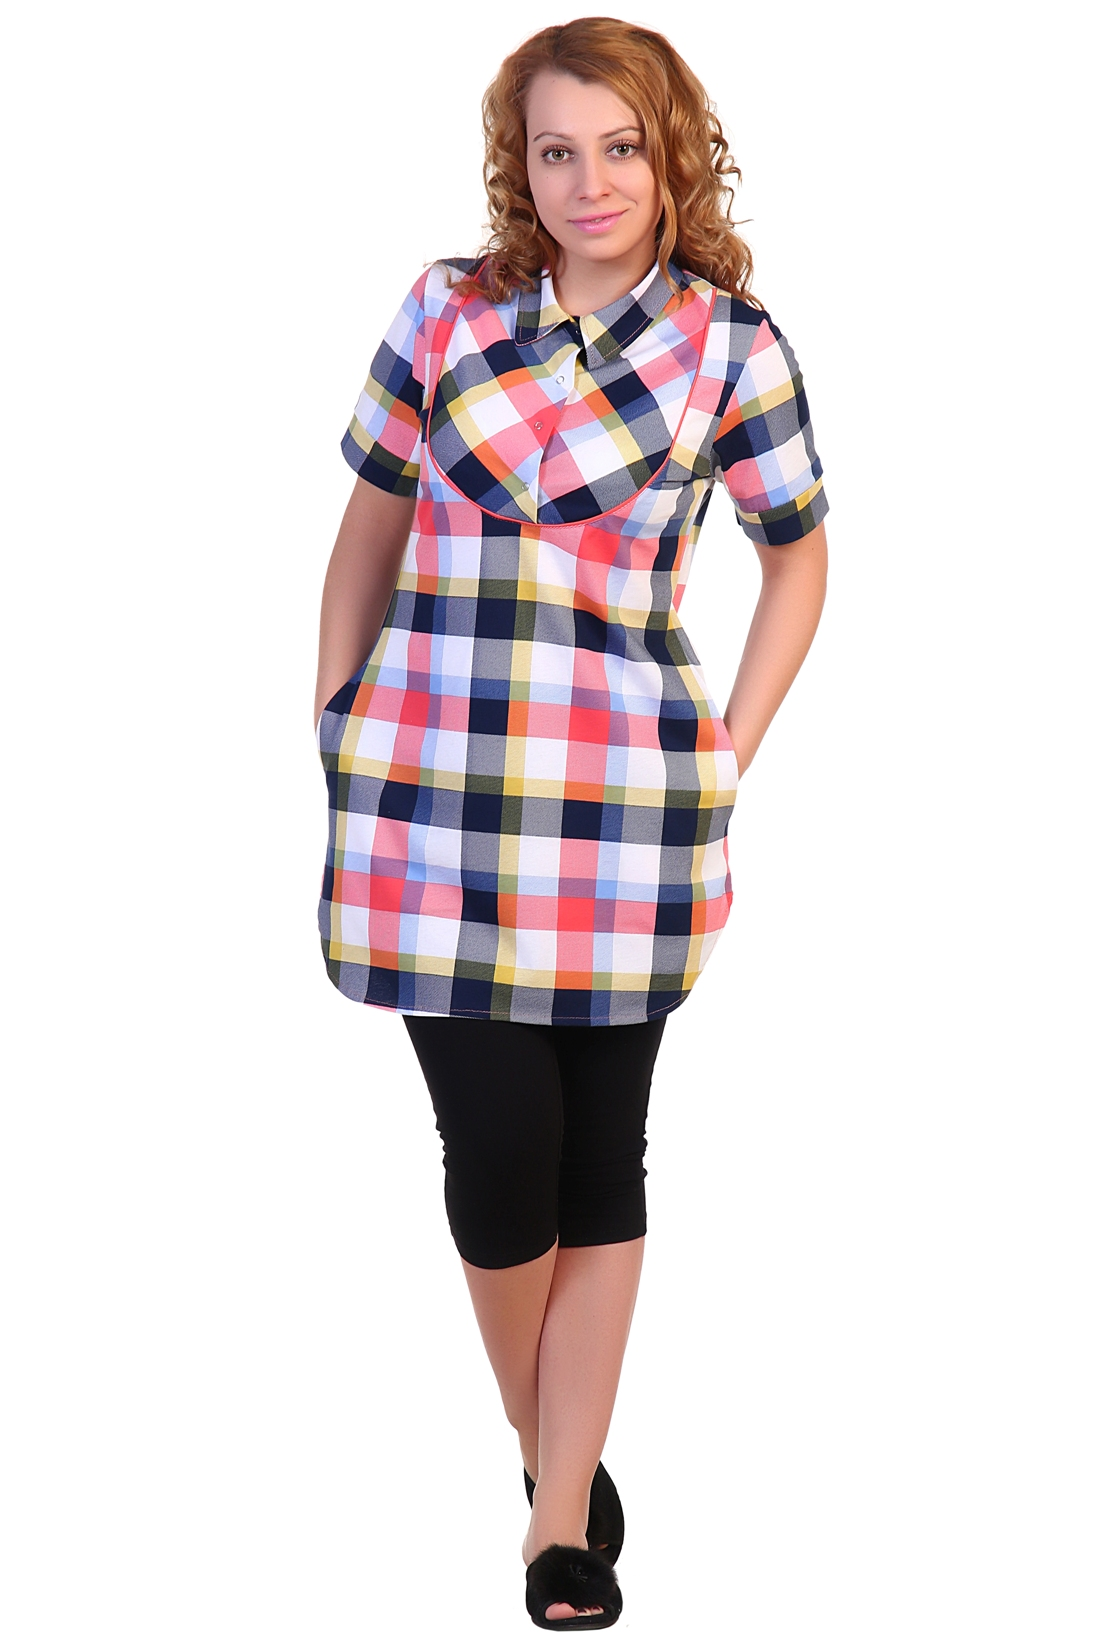 Жен. туника арт. 16-0295 р. 64 - Женская одежда артикул: 34153